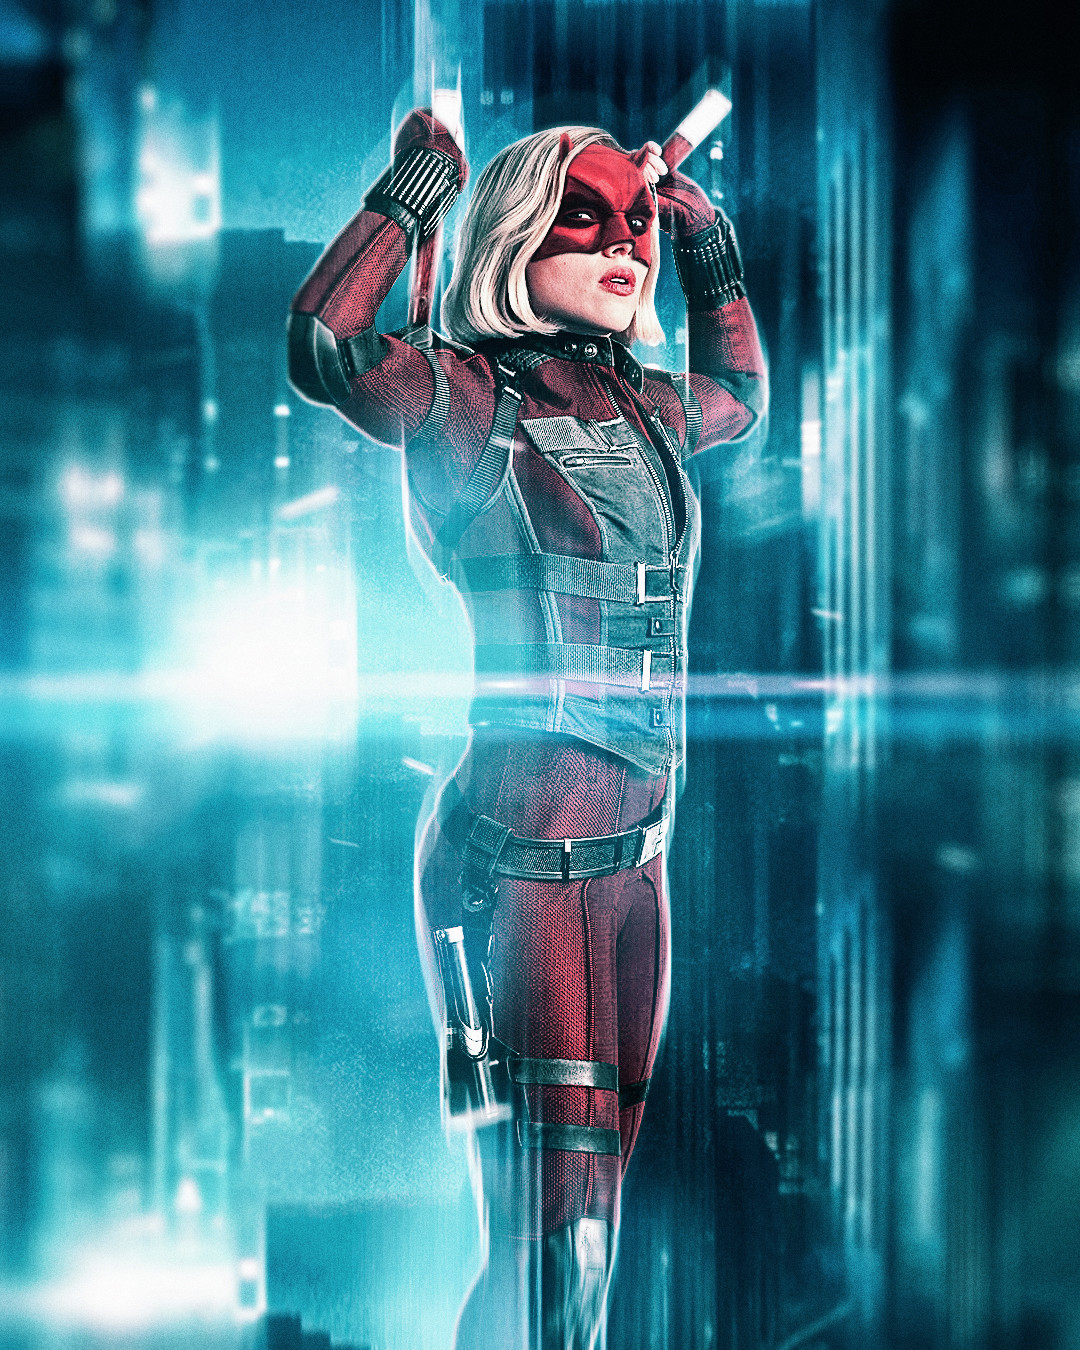 Black Widow x Daredevil mashup